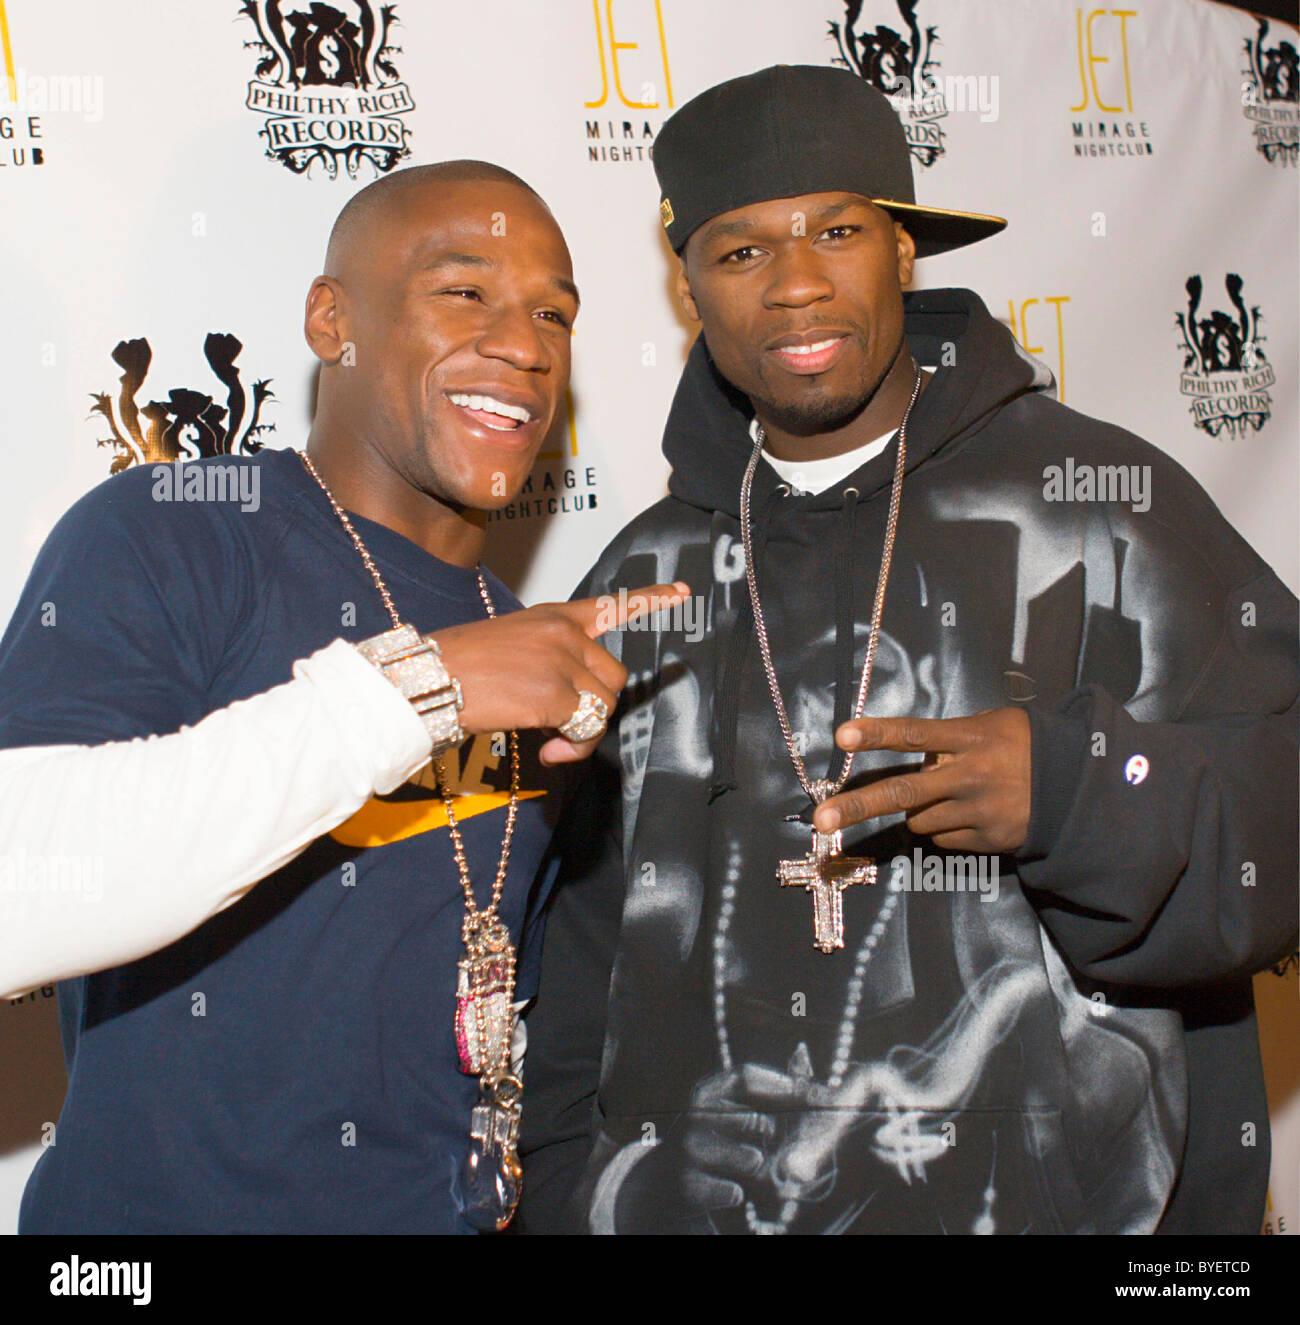 Floyd Mayweather 50 Cent Jet Stock Photos & Floyd Mayweather